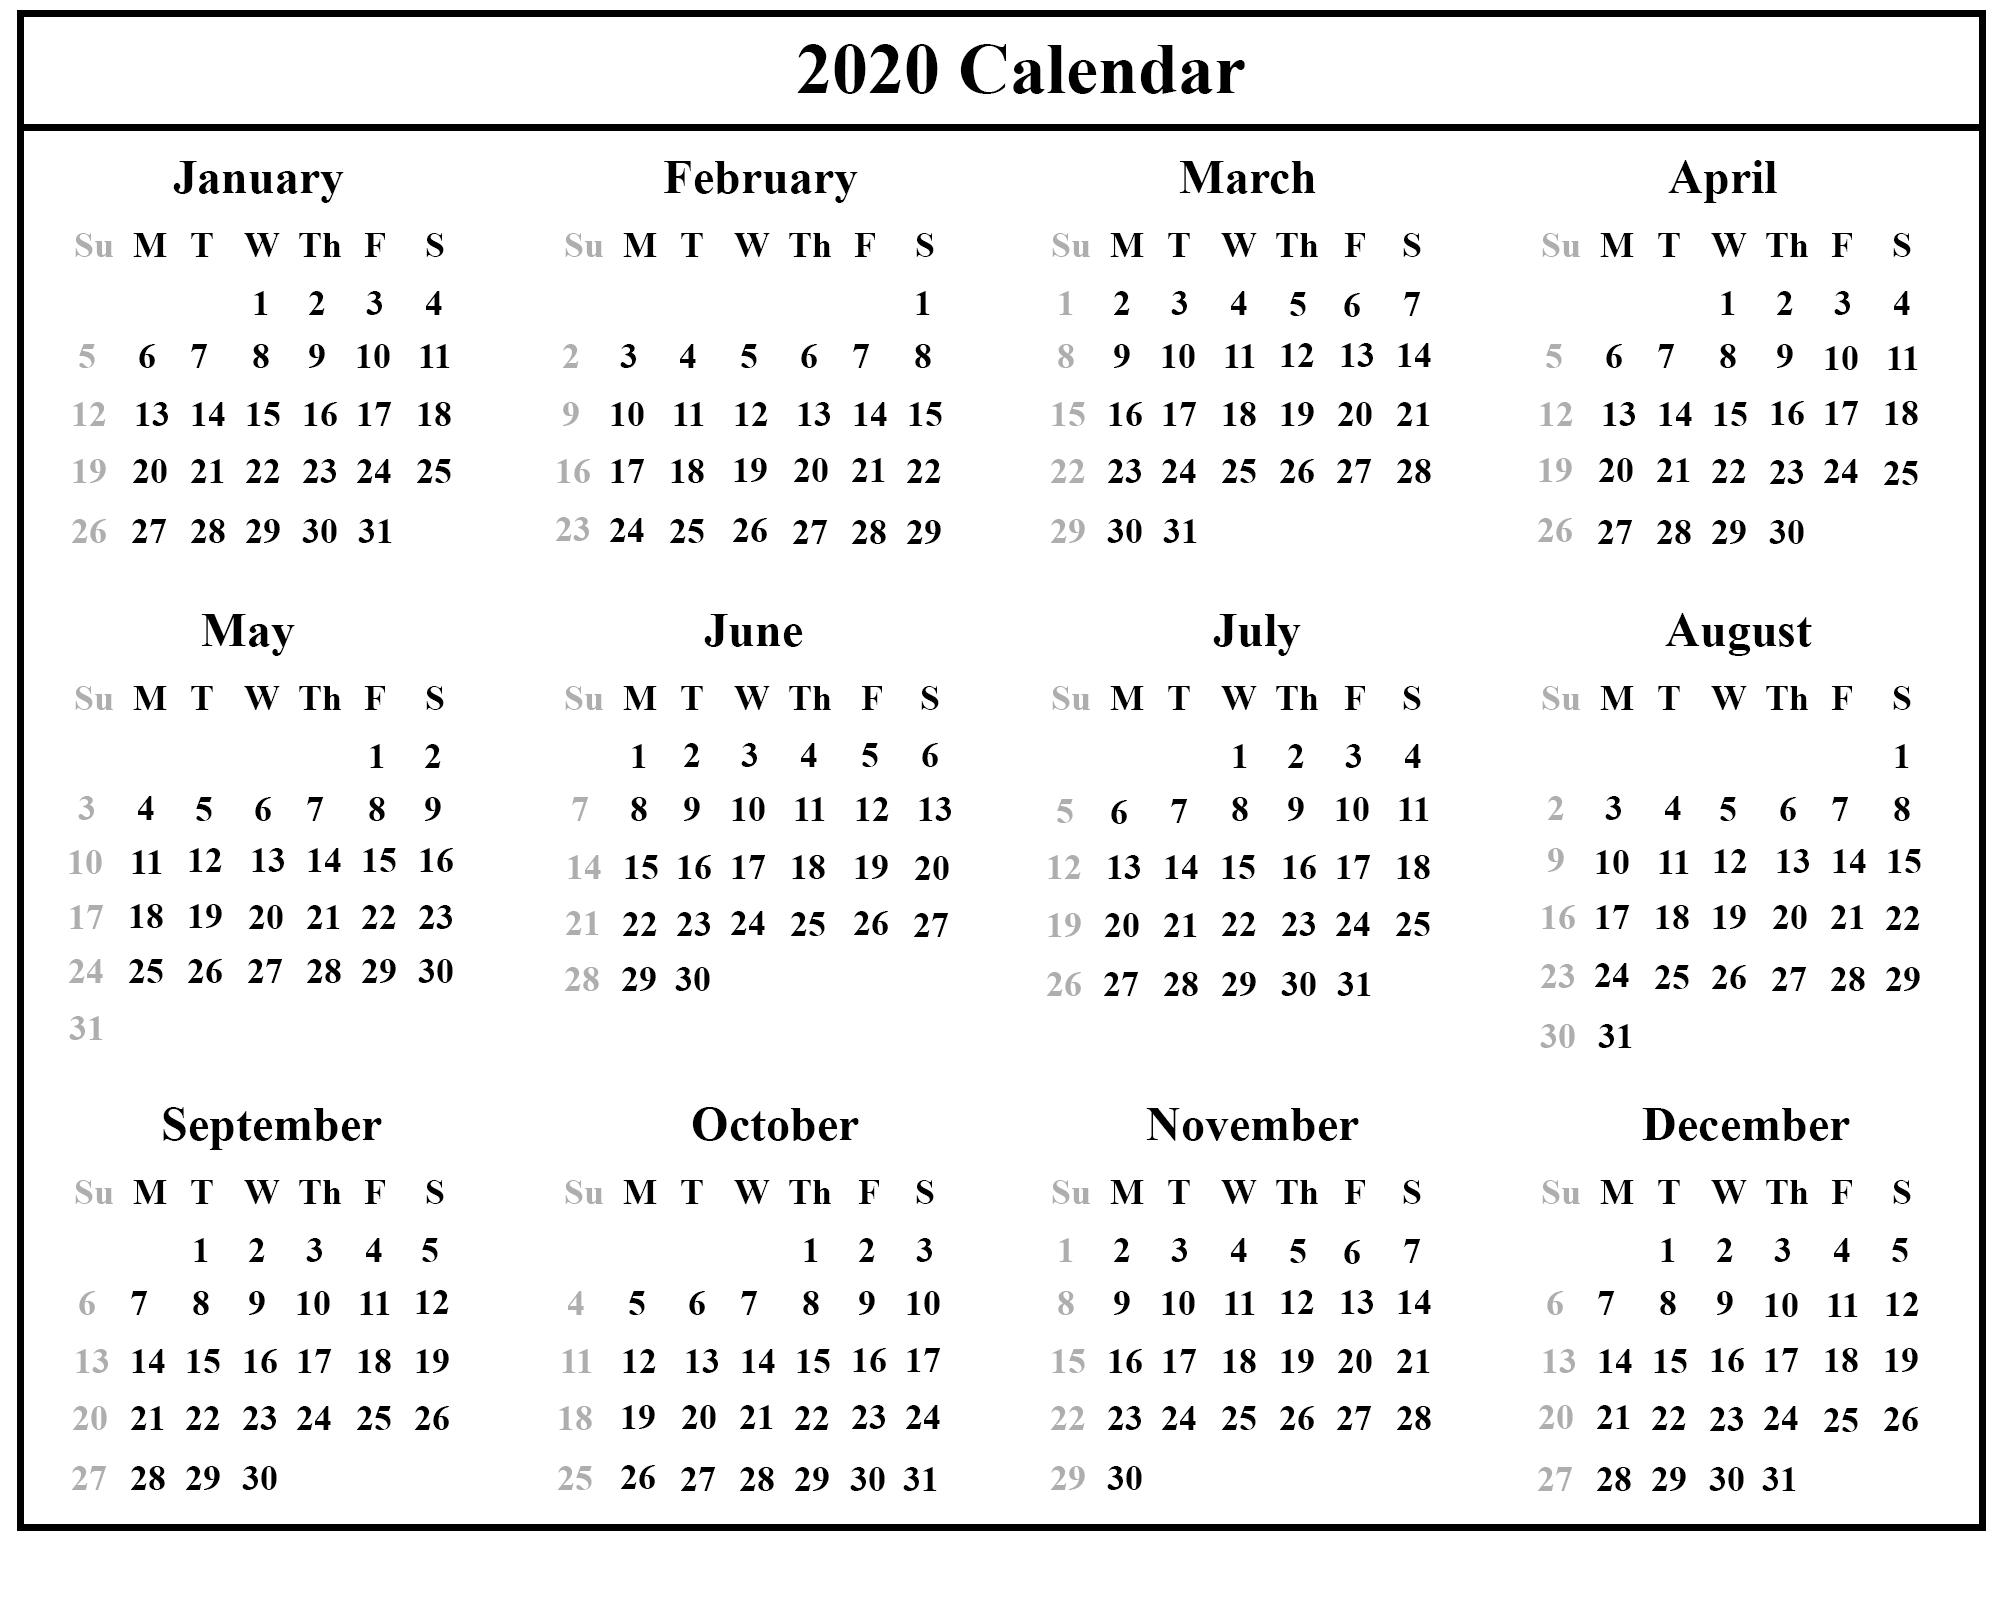 Printable Free Download Singapore Calendar 2020 [Pdf, Excel